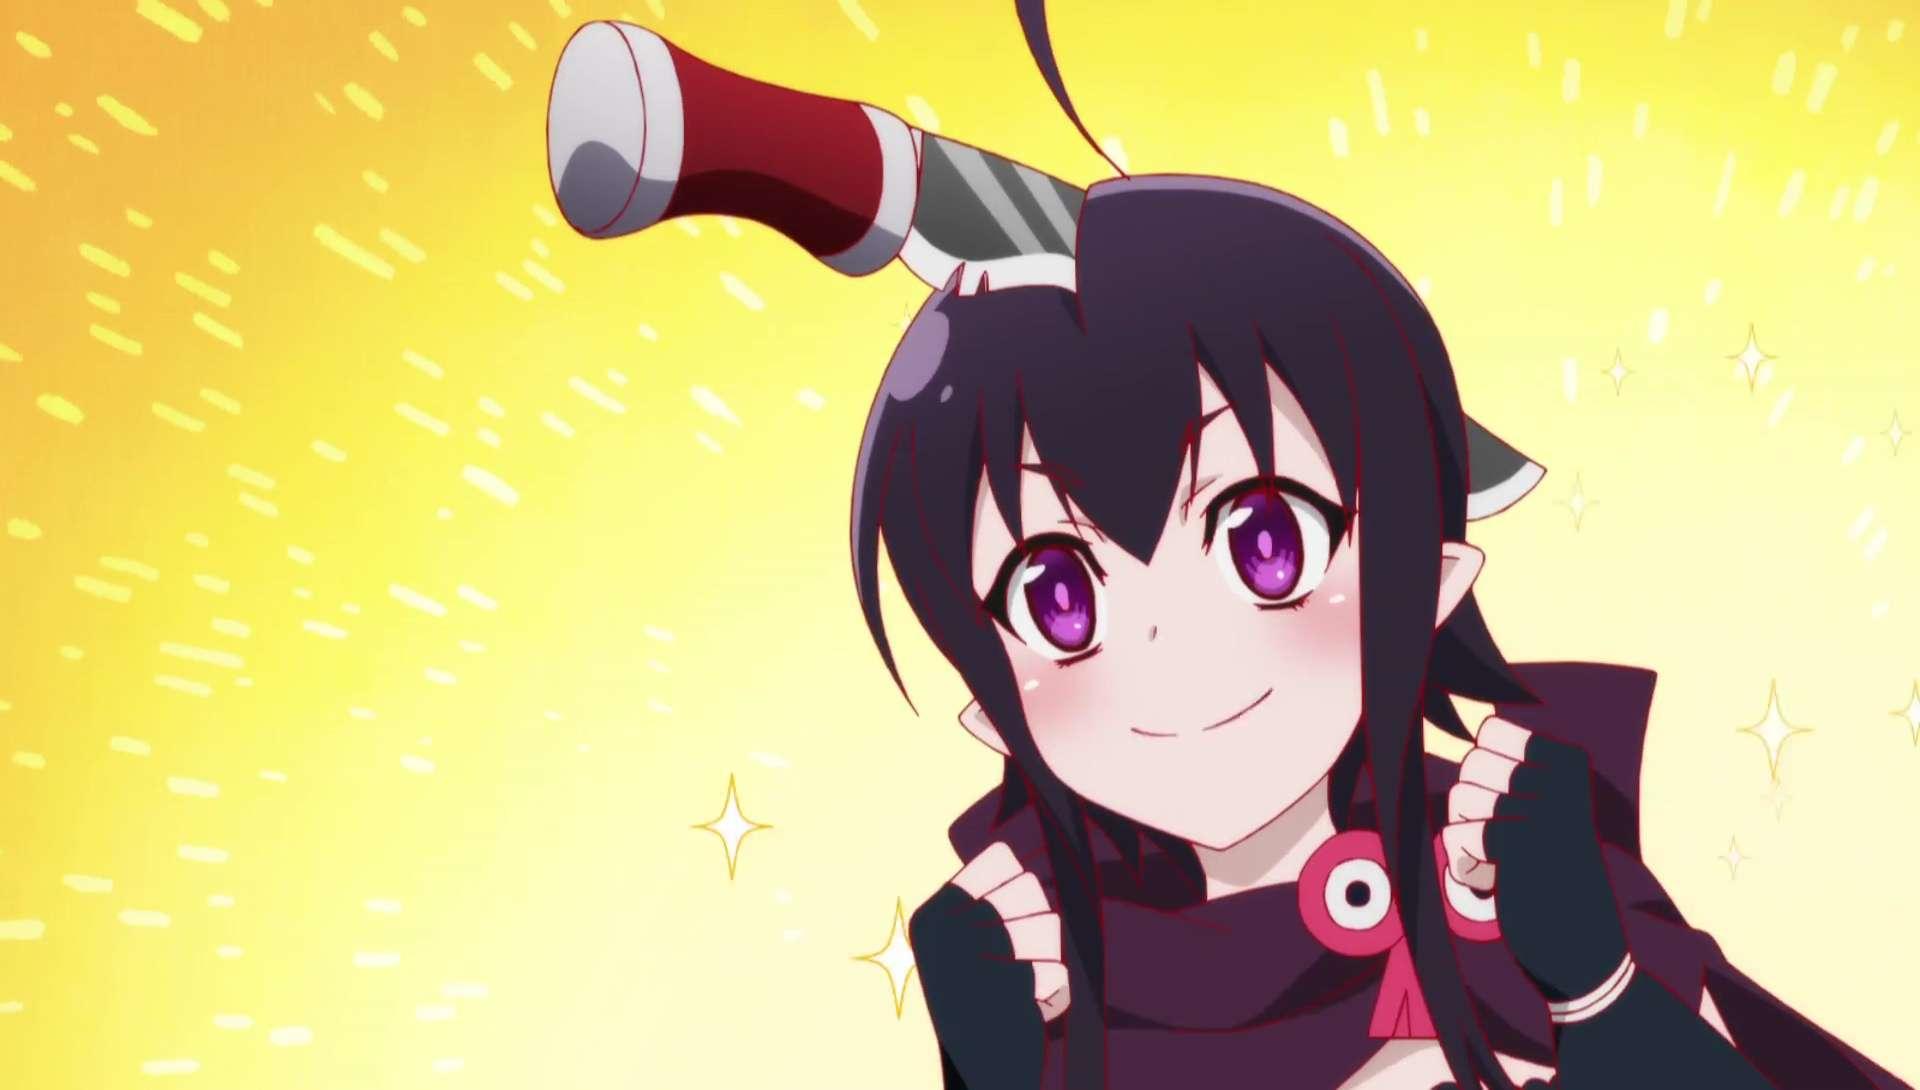 spring 2017 anime: love tyrant - the indonesian anime times